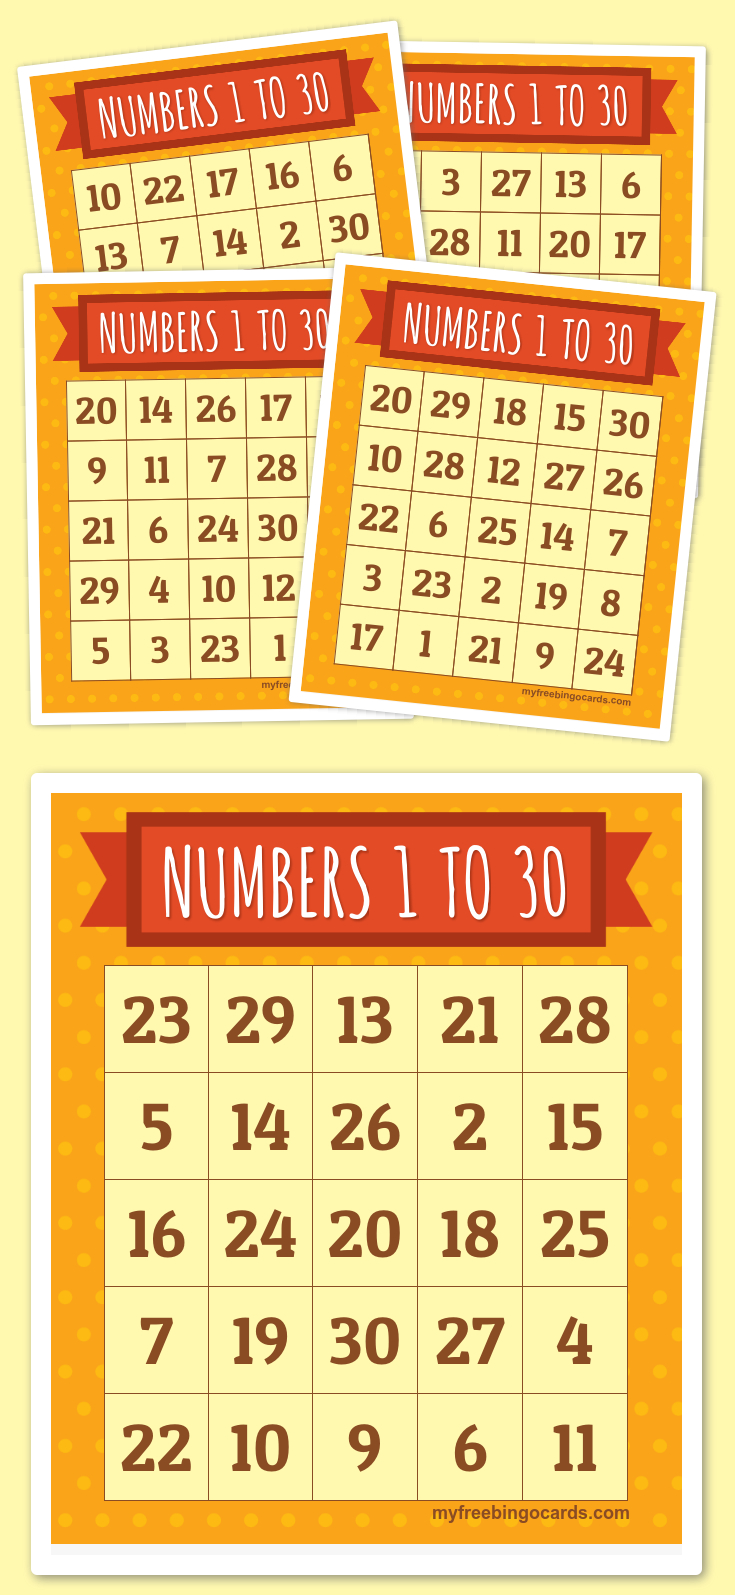 Free Printable Bingo Cards | Bingo Cards, Bingo Printable